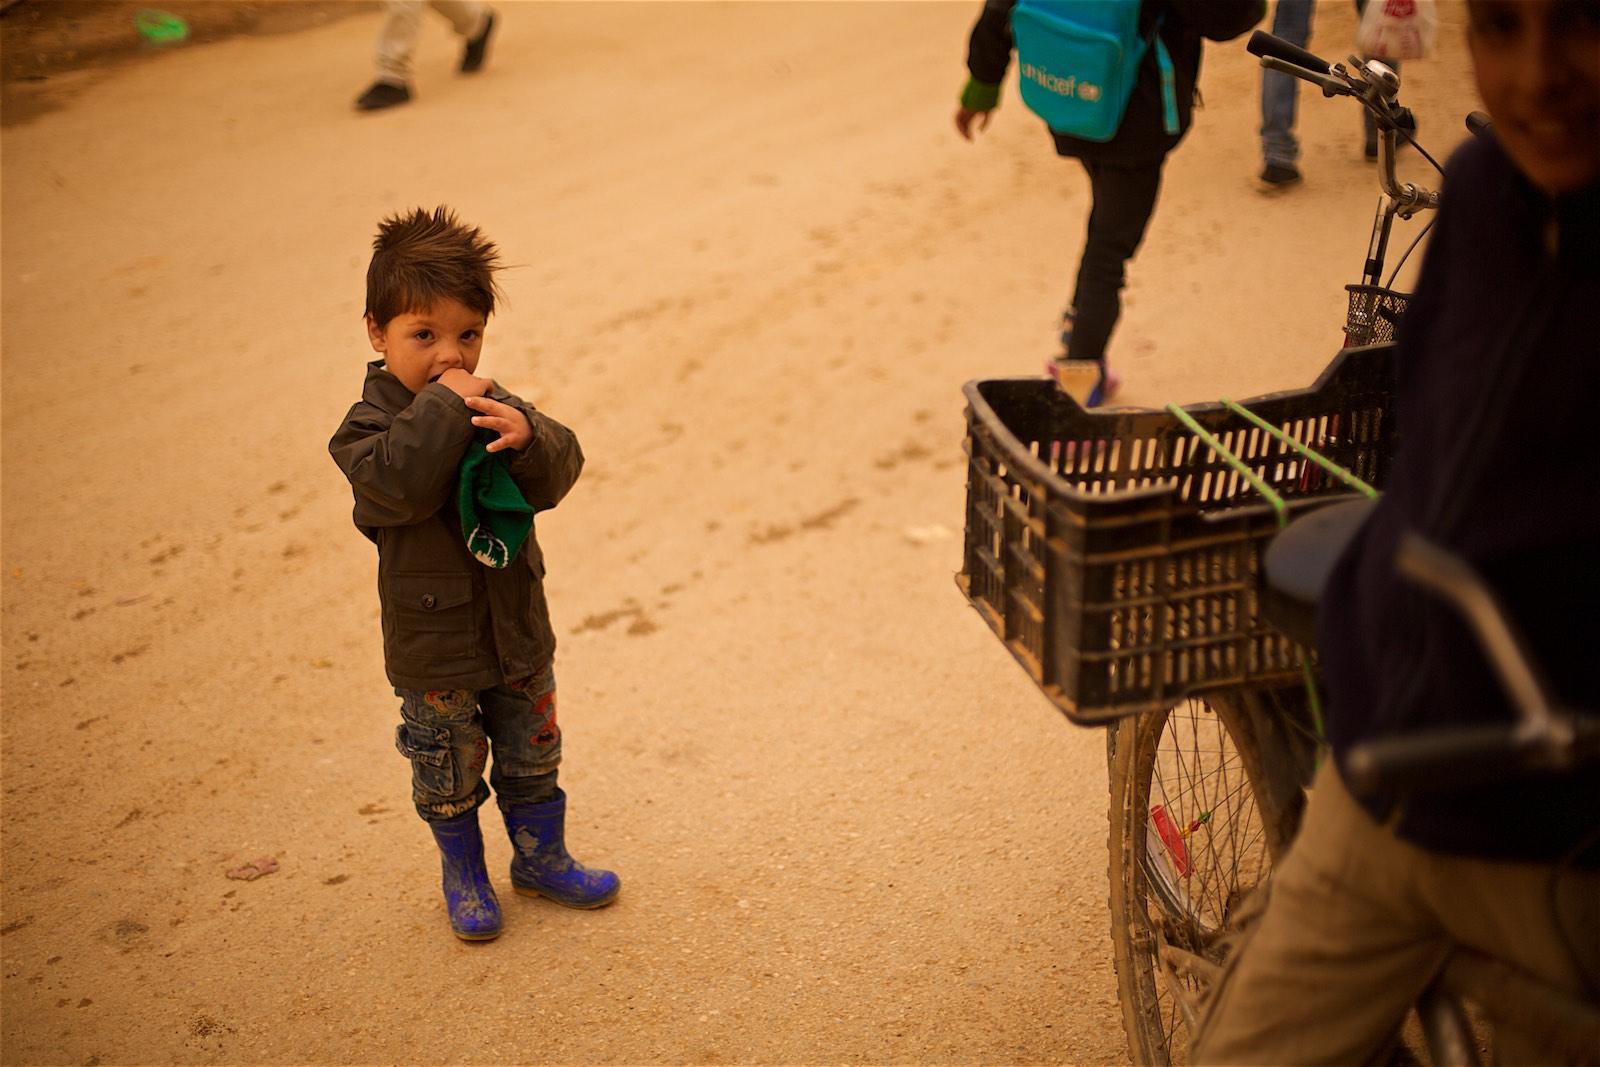 zaatari-camp-denis-bosnic-jordan-syria-war-2.jpg